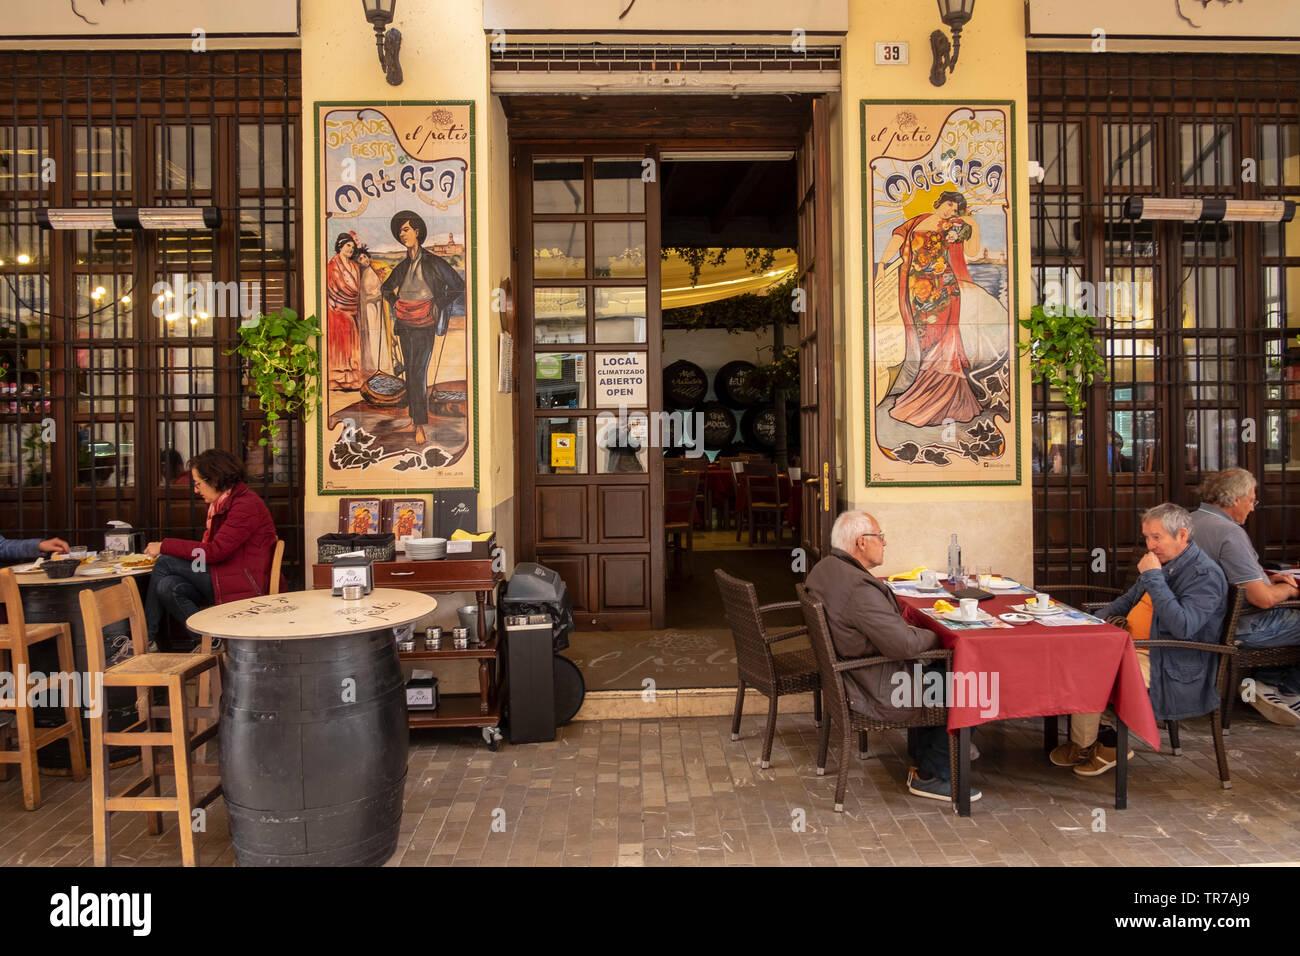 El Patio Bodega Traditional Style Bar In Malaga Spain Stock Photo Alamy